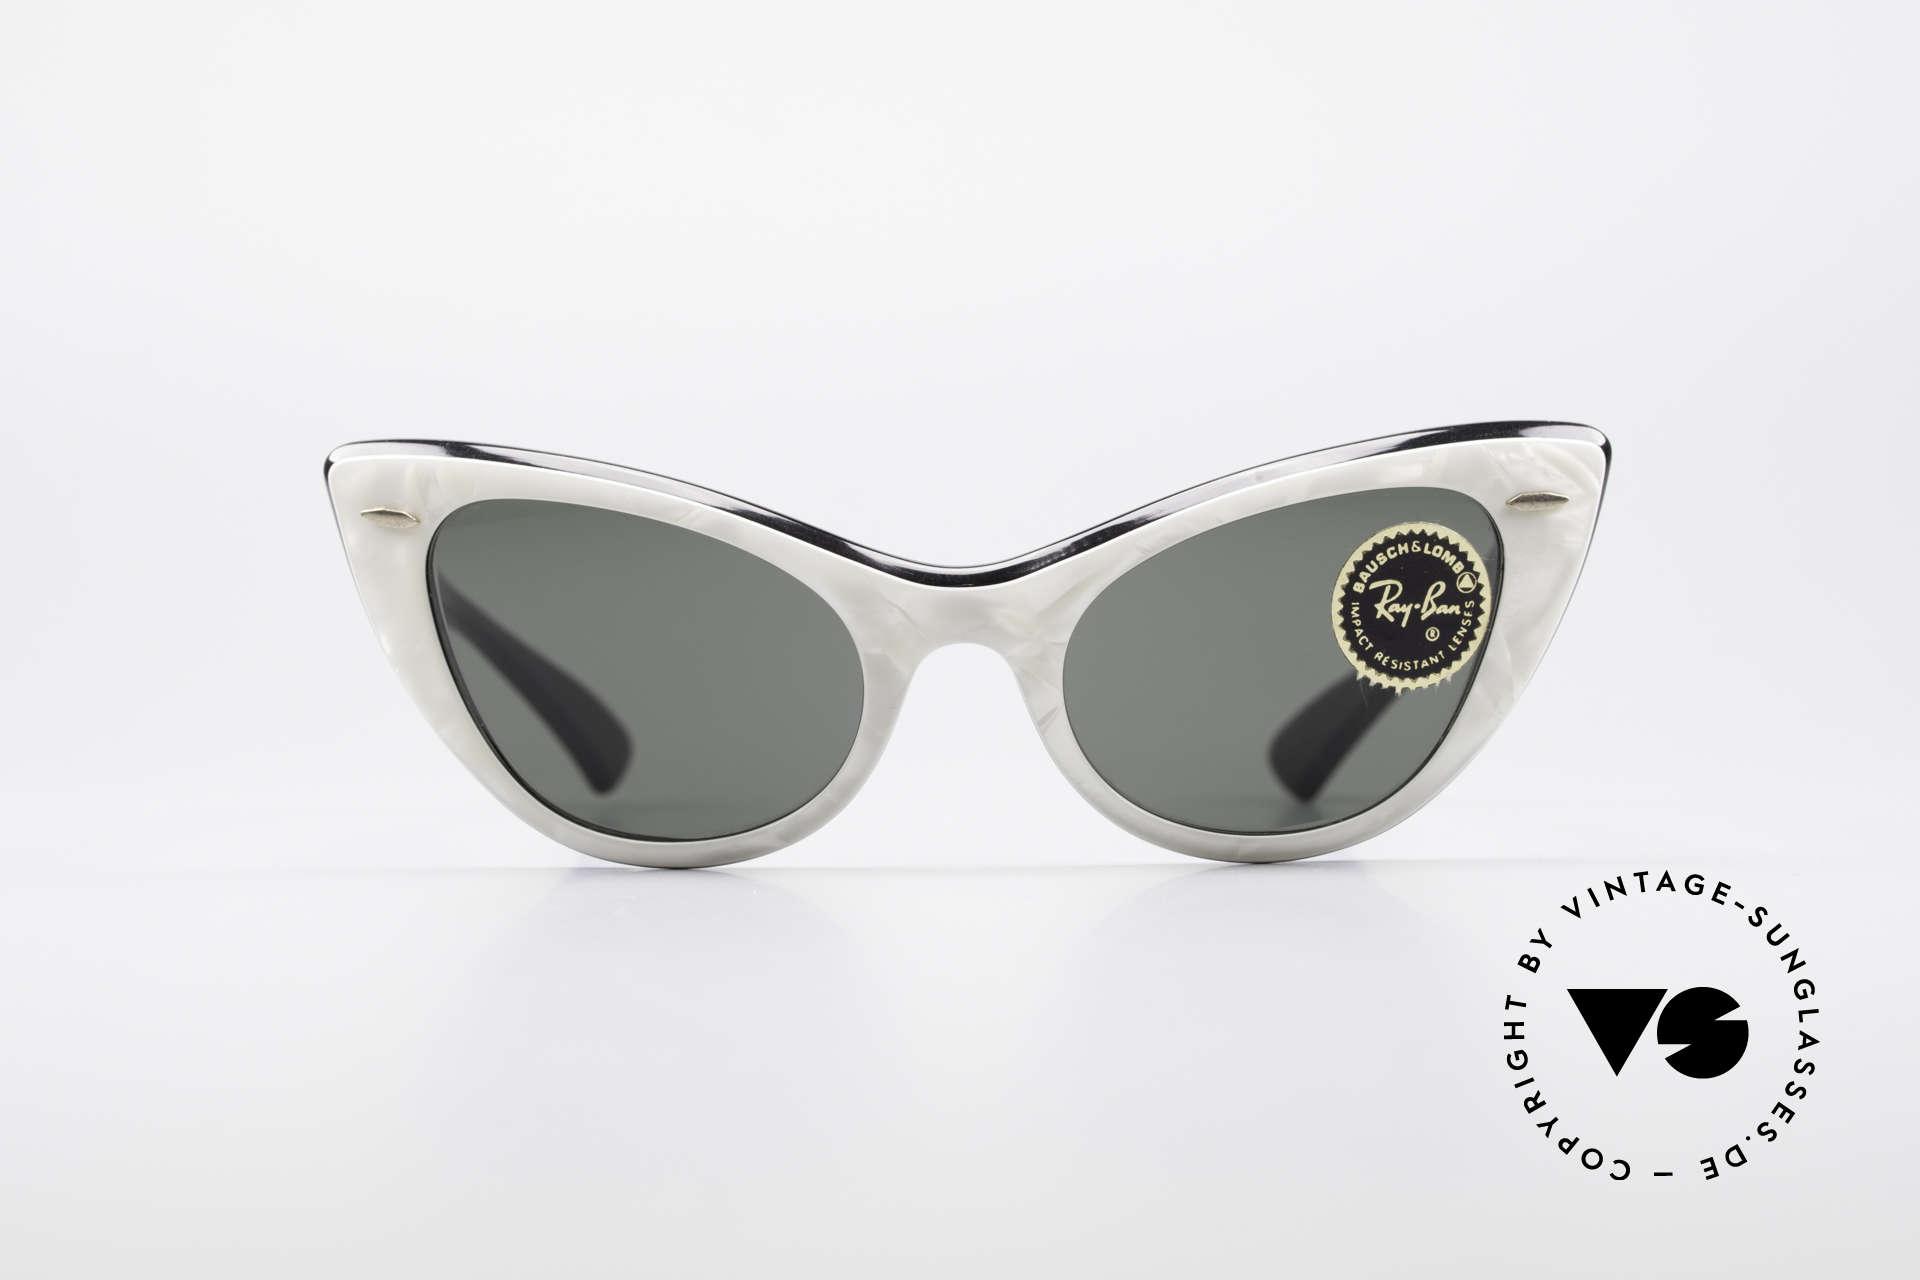 98cf47c3822 Vintage Ray Ban Cat Eye Sunglasses « One More Soul